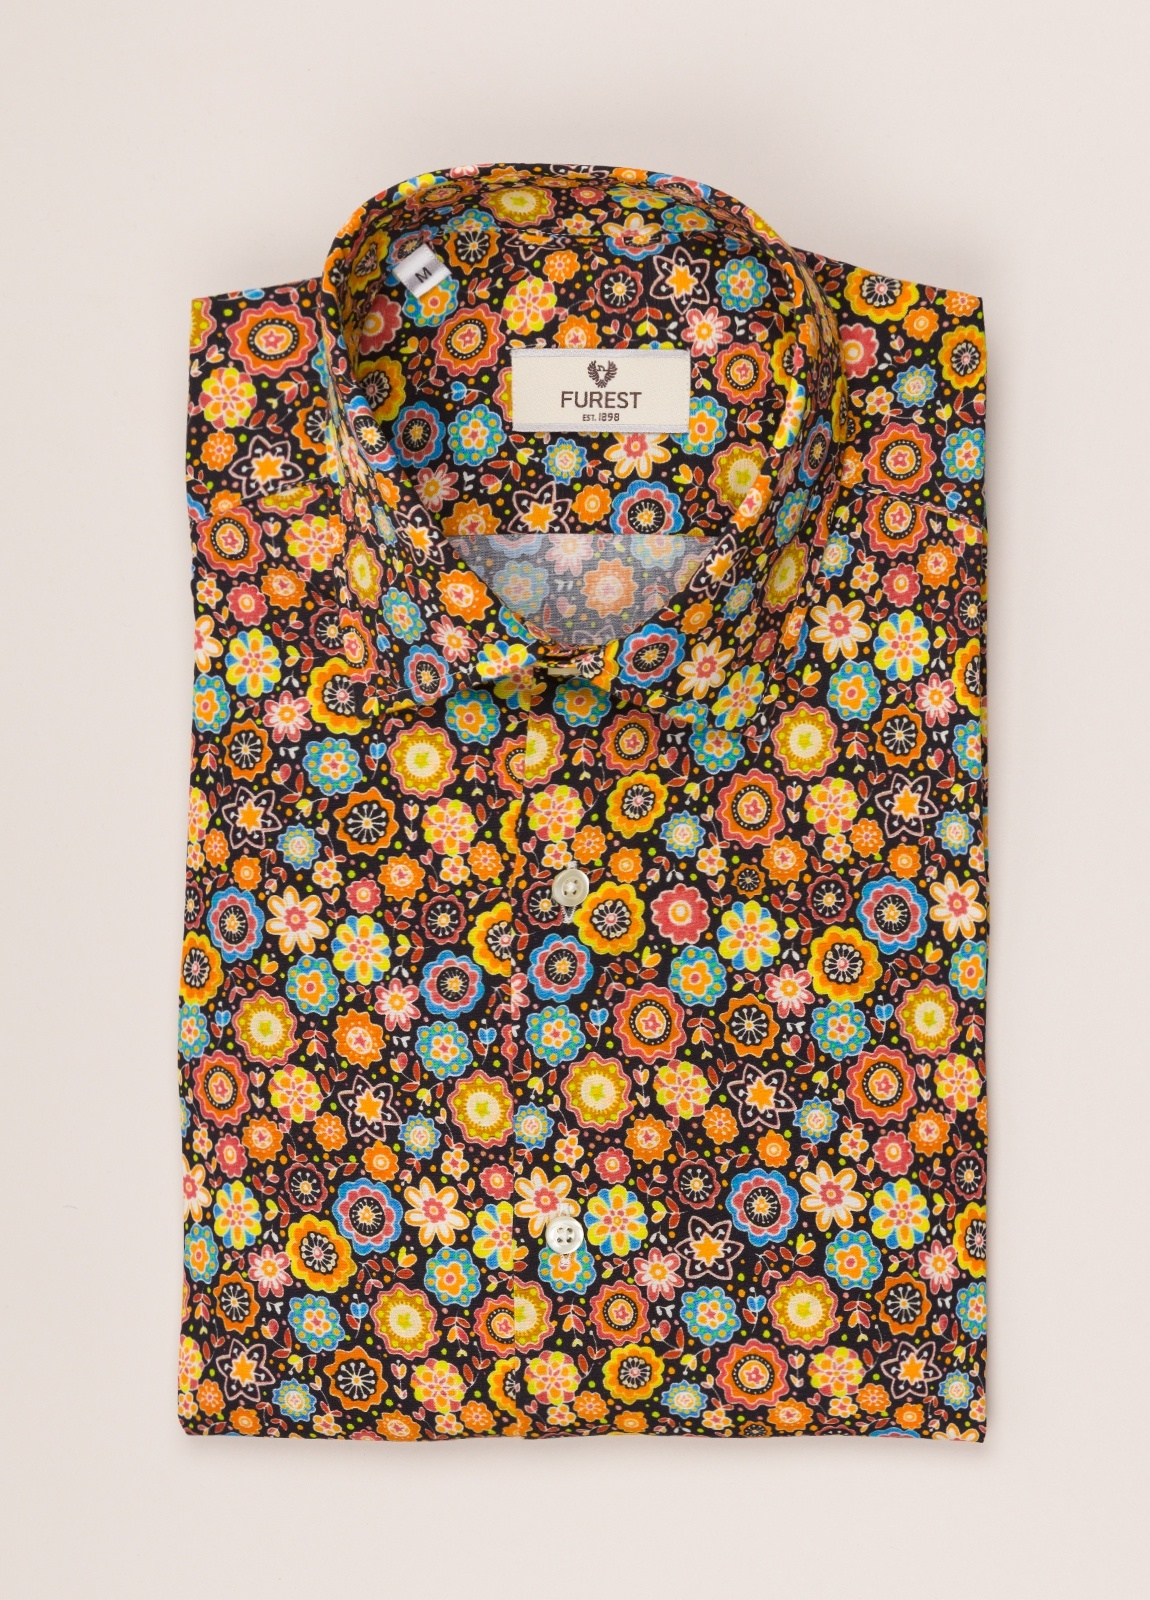 Camisa sport FUREST COLECCIÓN SLIM FIT flores tostado